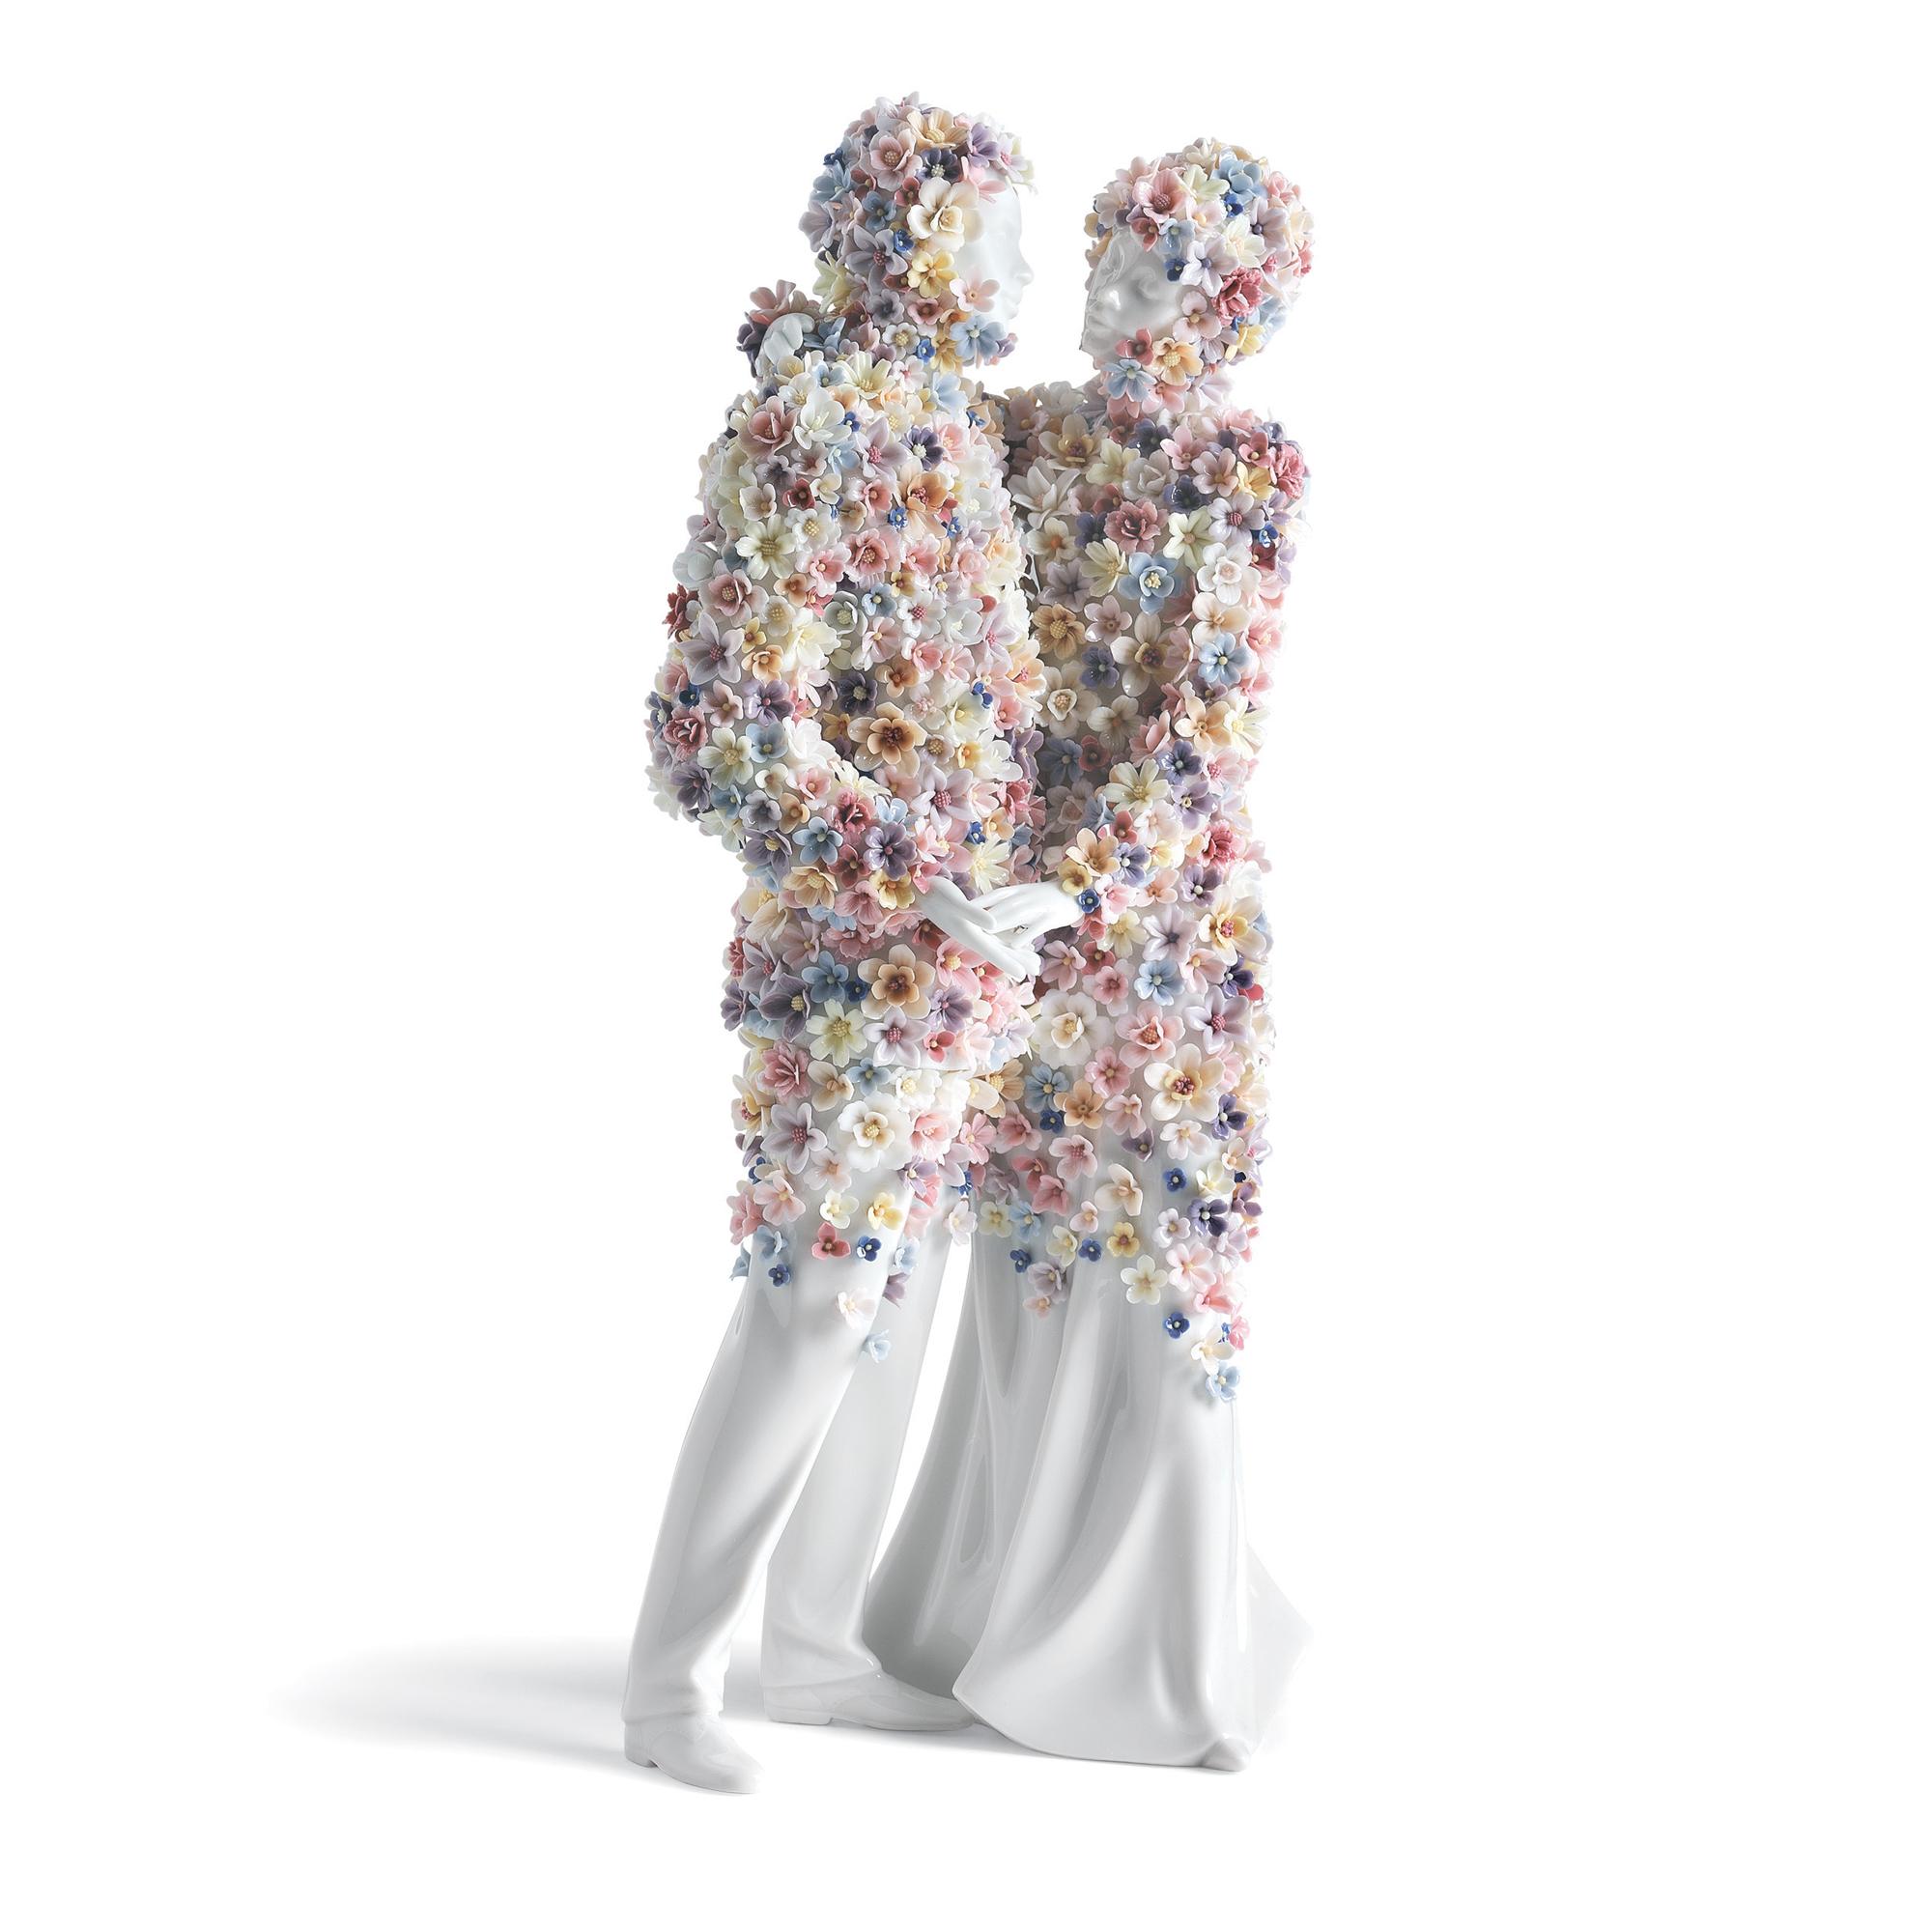 Love III (Blossoms) 1007233 - Lladro Romanticism